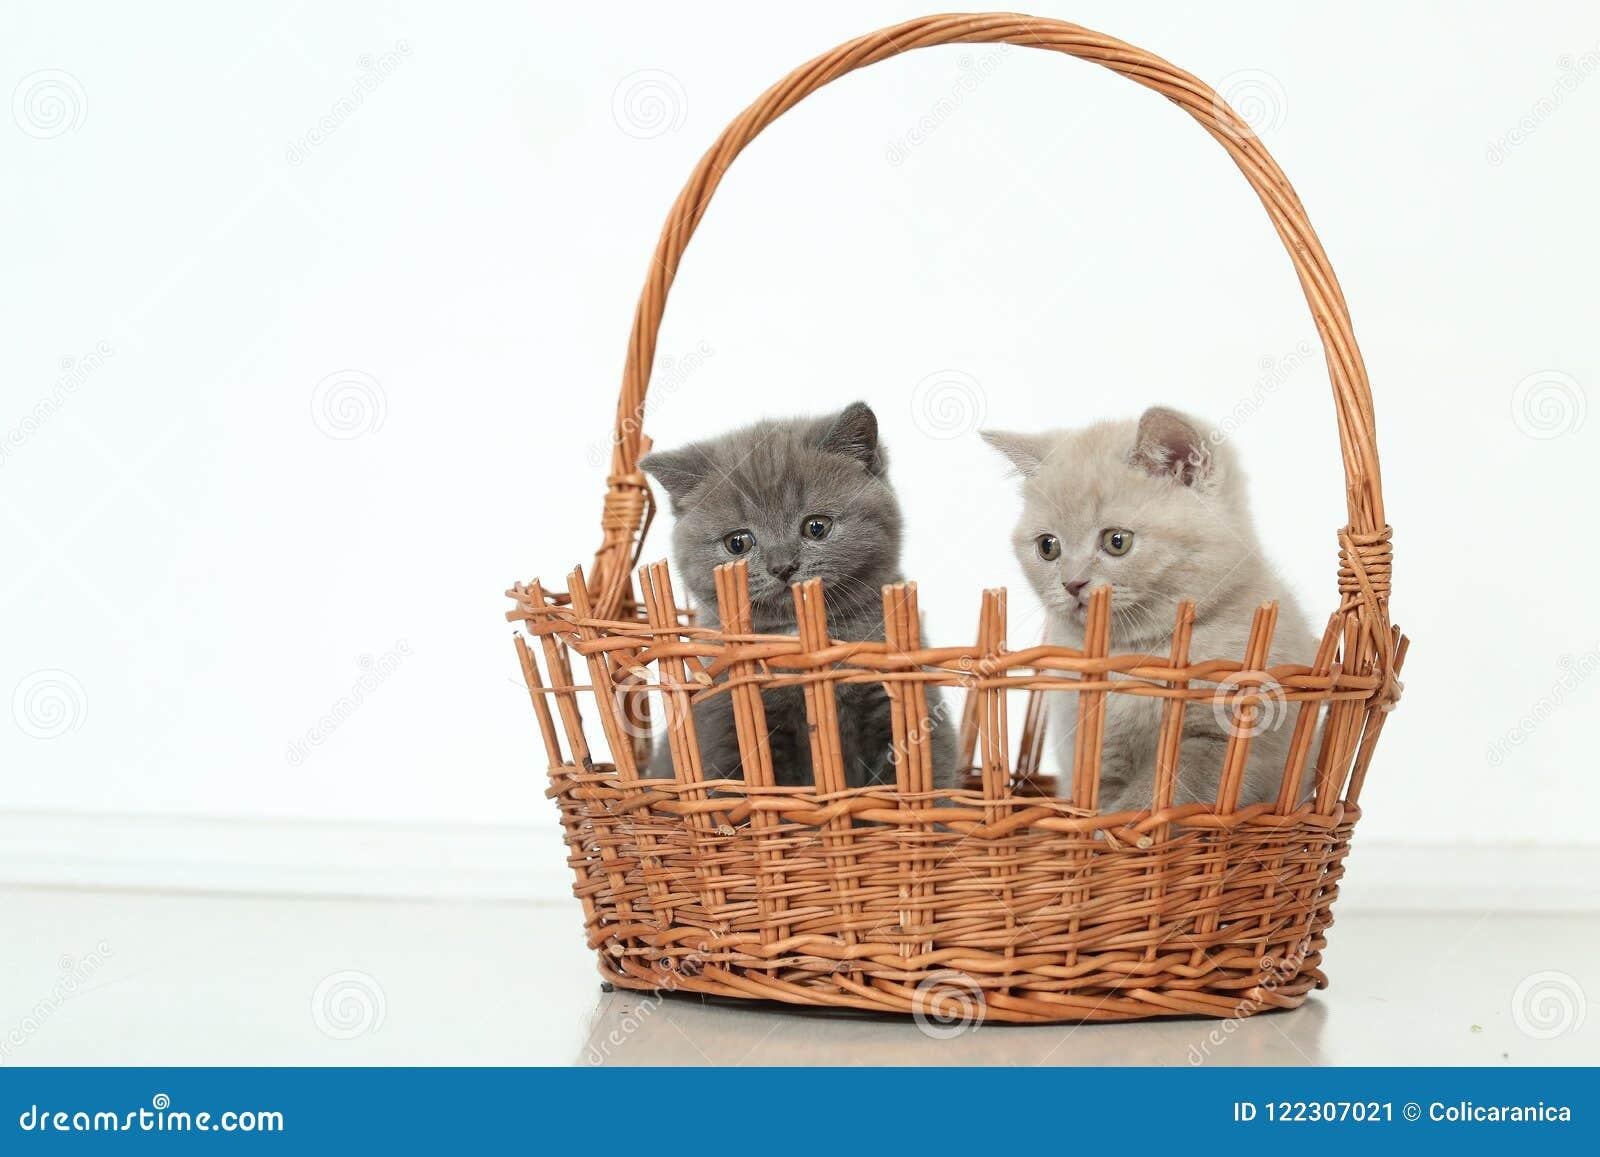 British Shorthair kittens in basket, isolated portrait